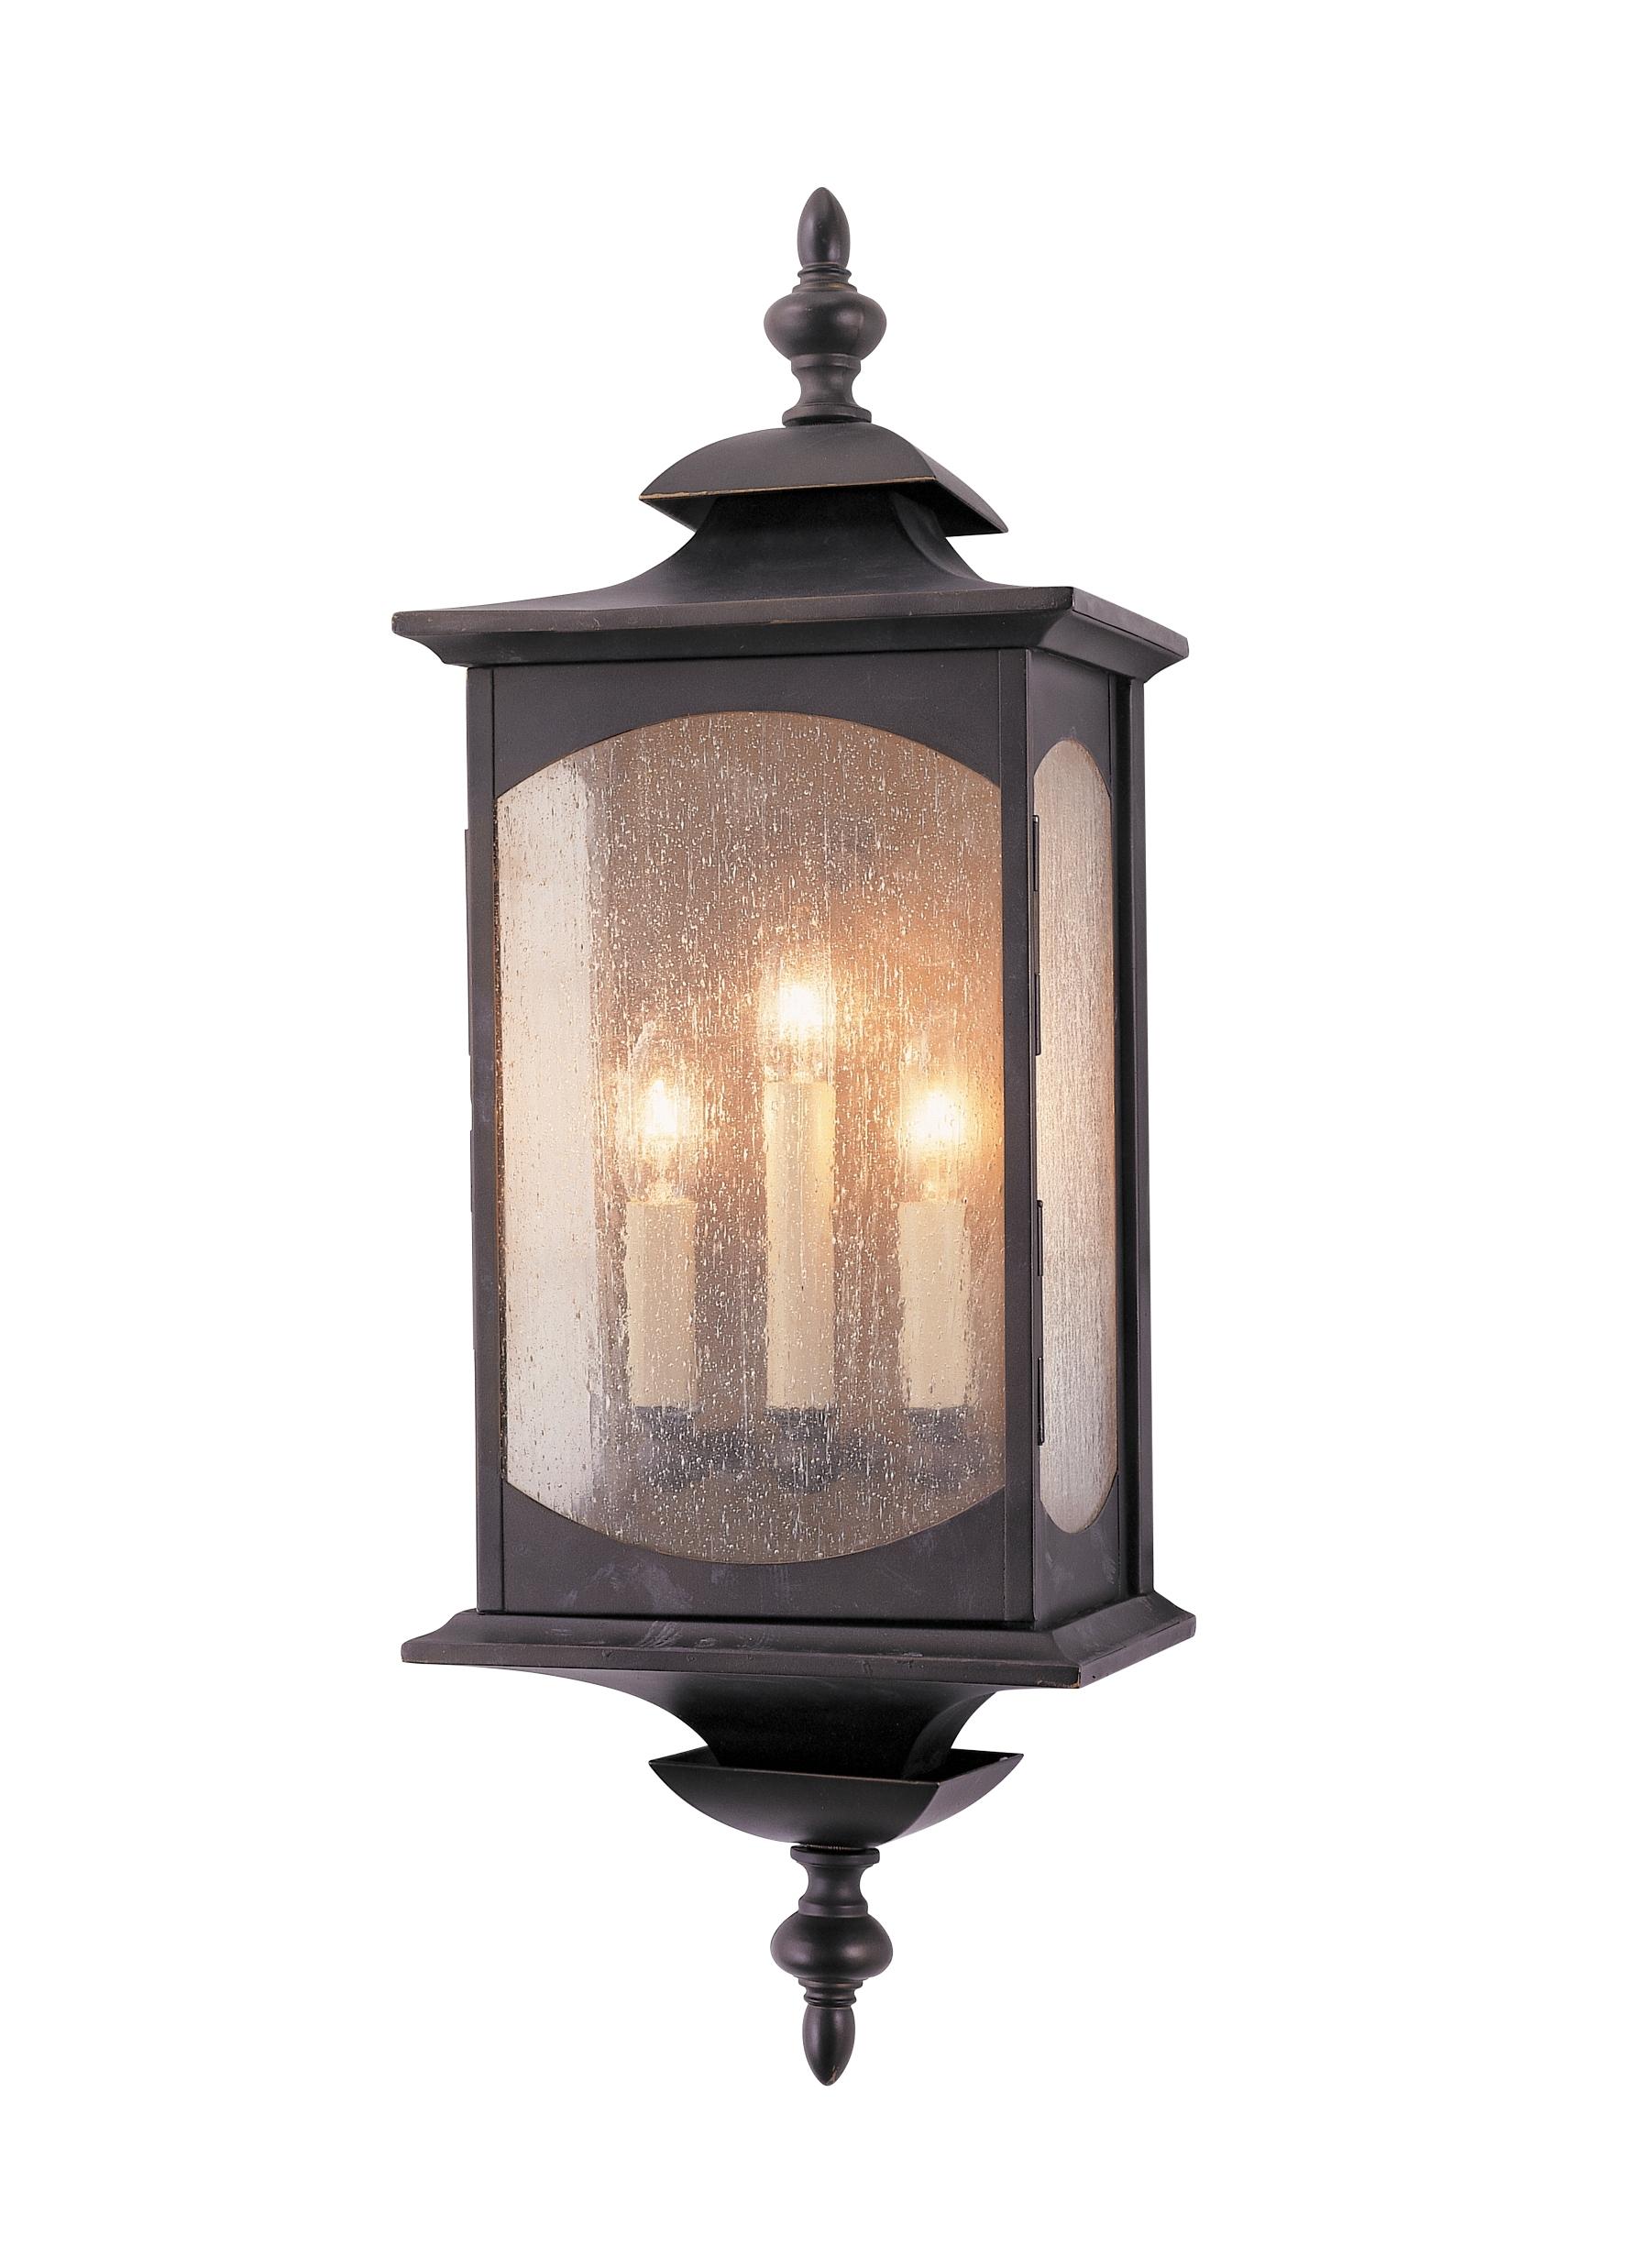 Ol2602Orb,3 - Light Wall Lantern,oil Rubbed Bronze regarding Outdoor Oil Lanterns (Image 11 of 20)